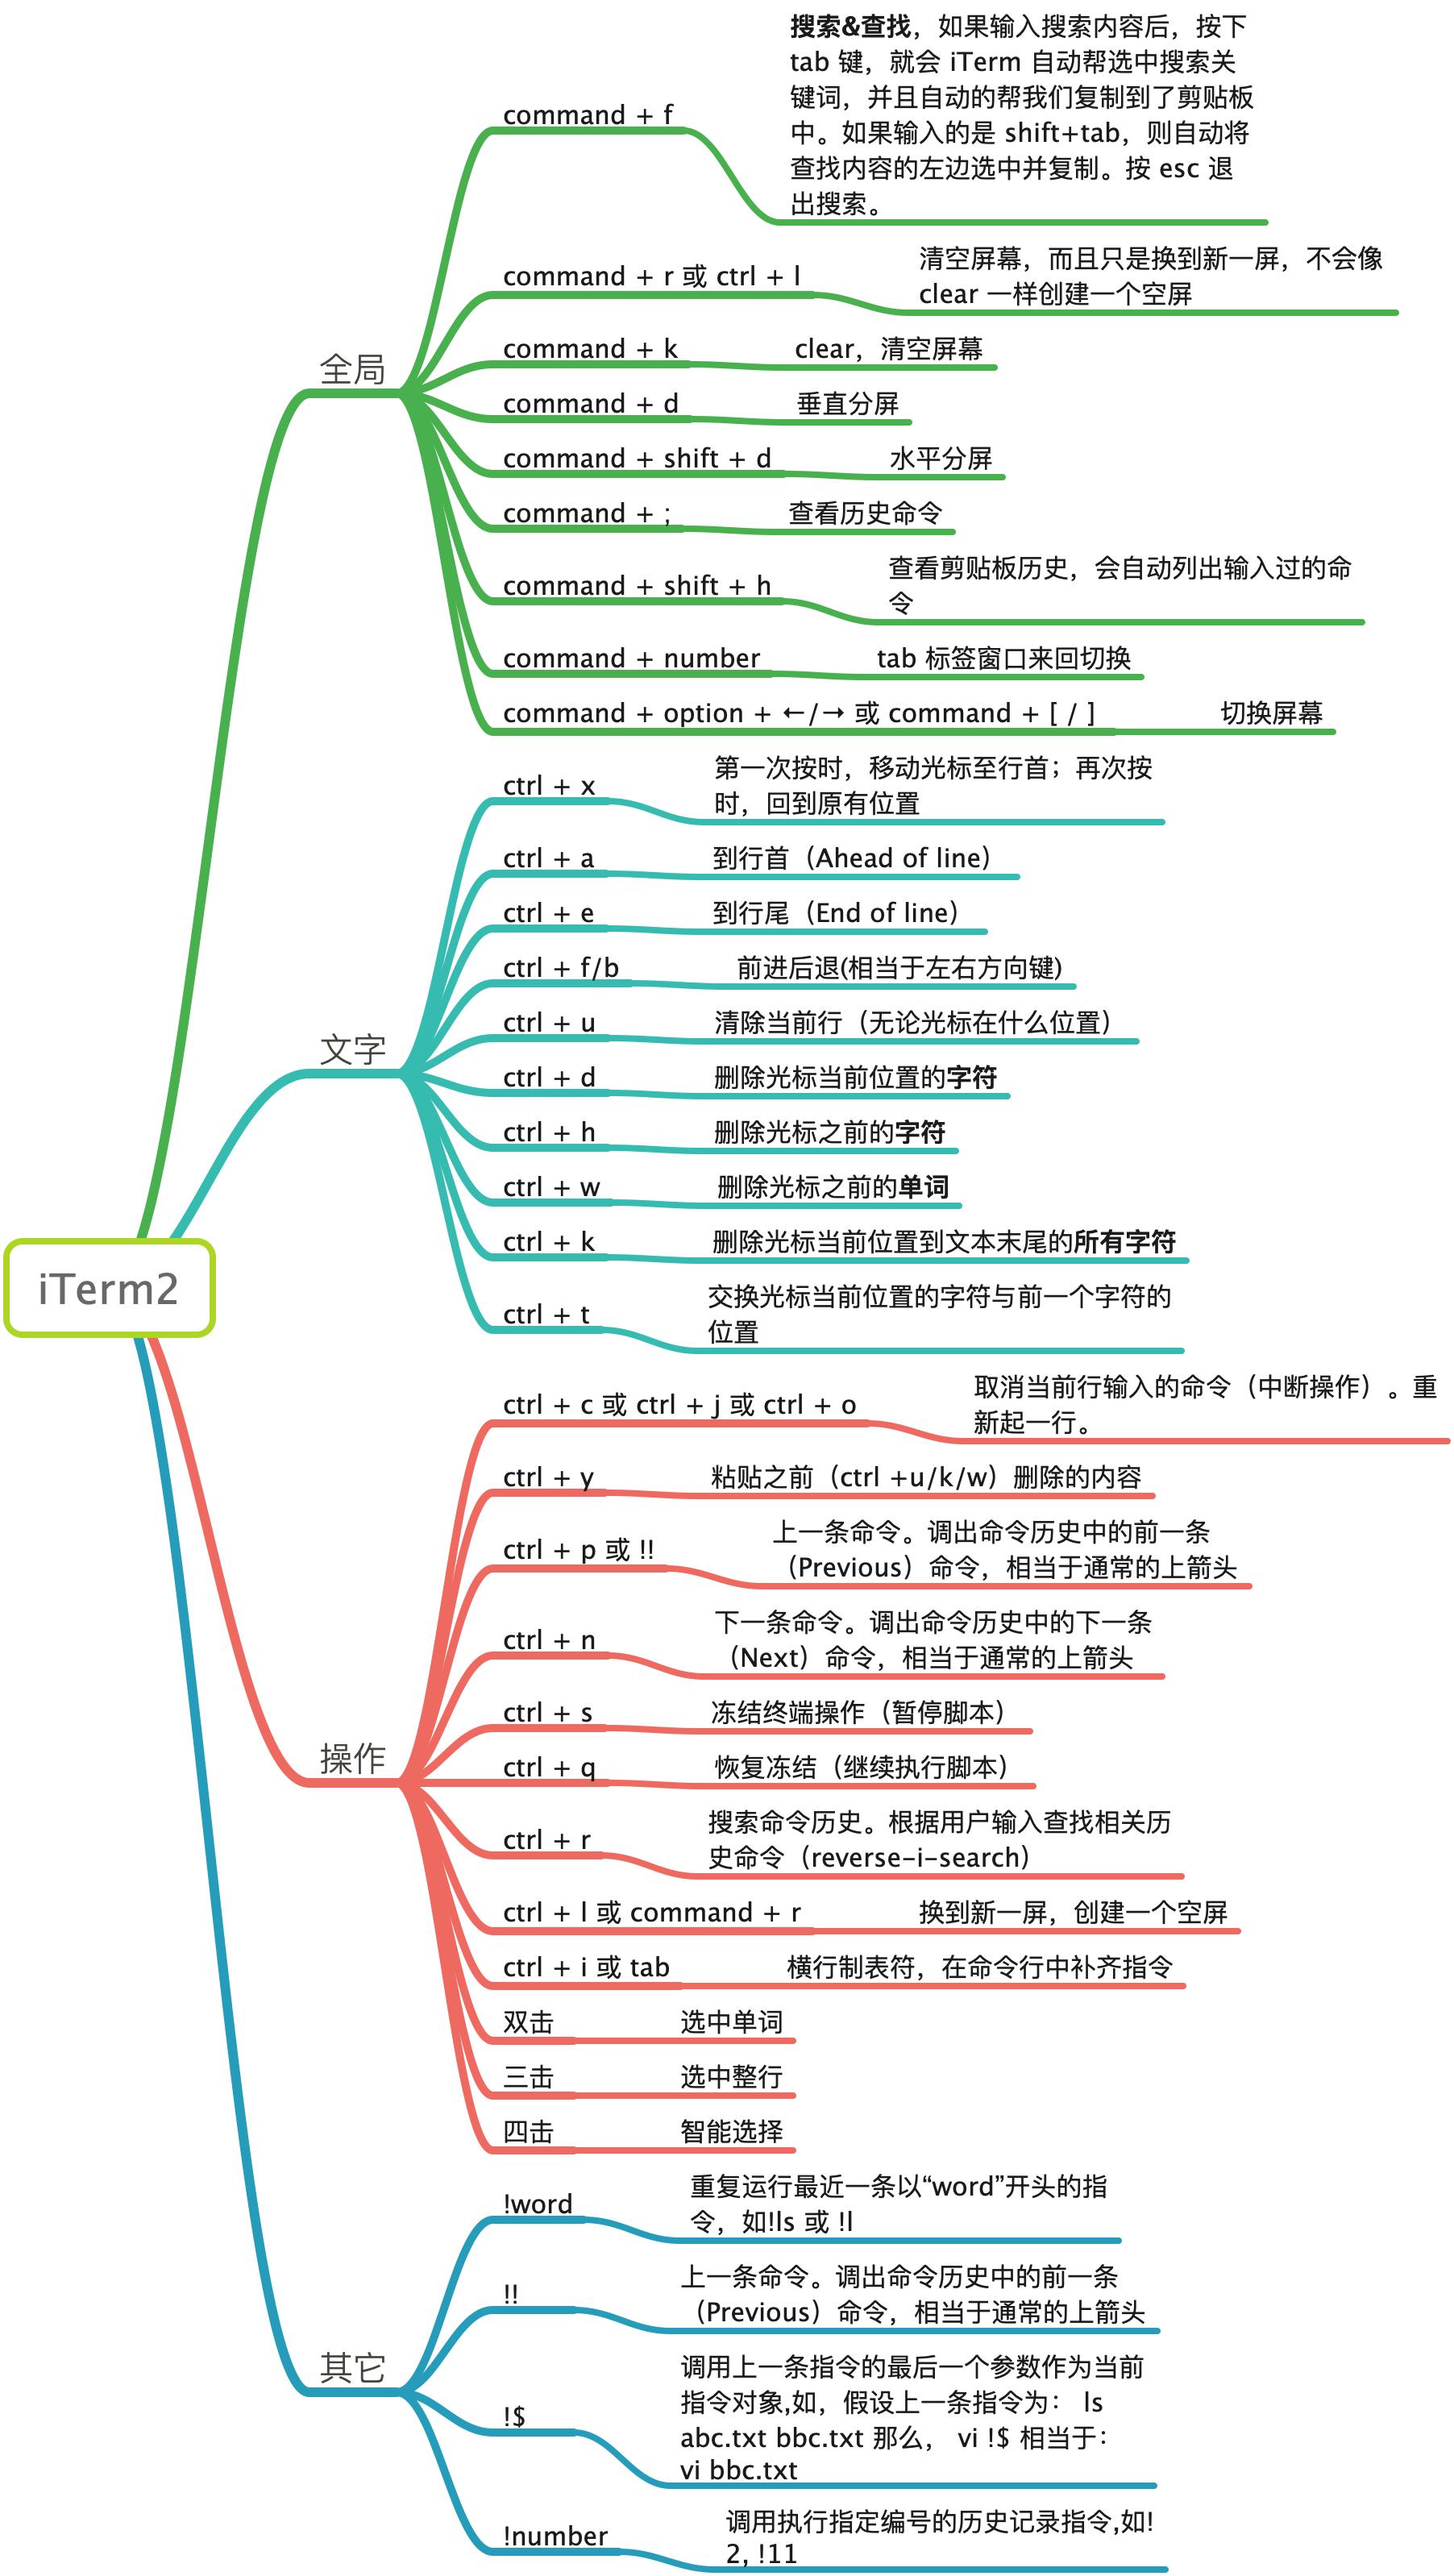 20190402-iTerm2快捷键大全